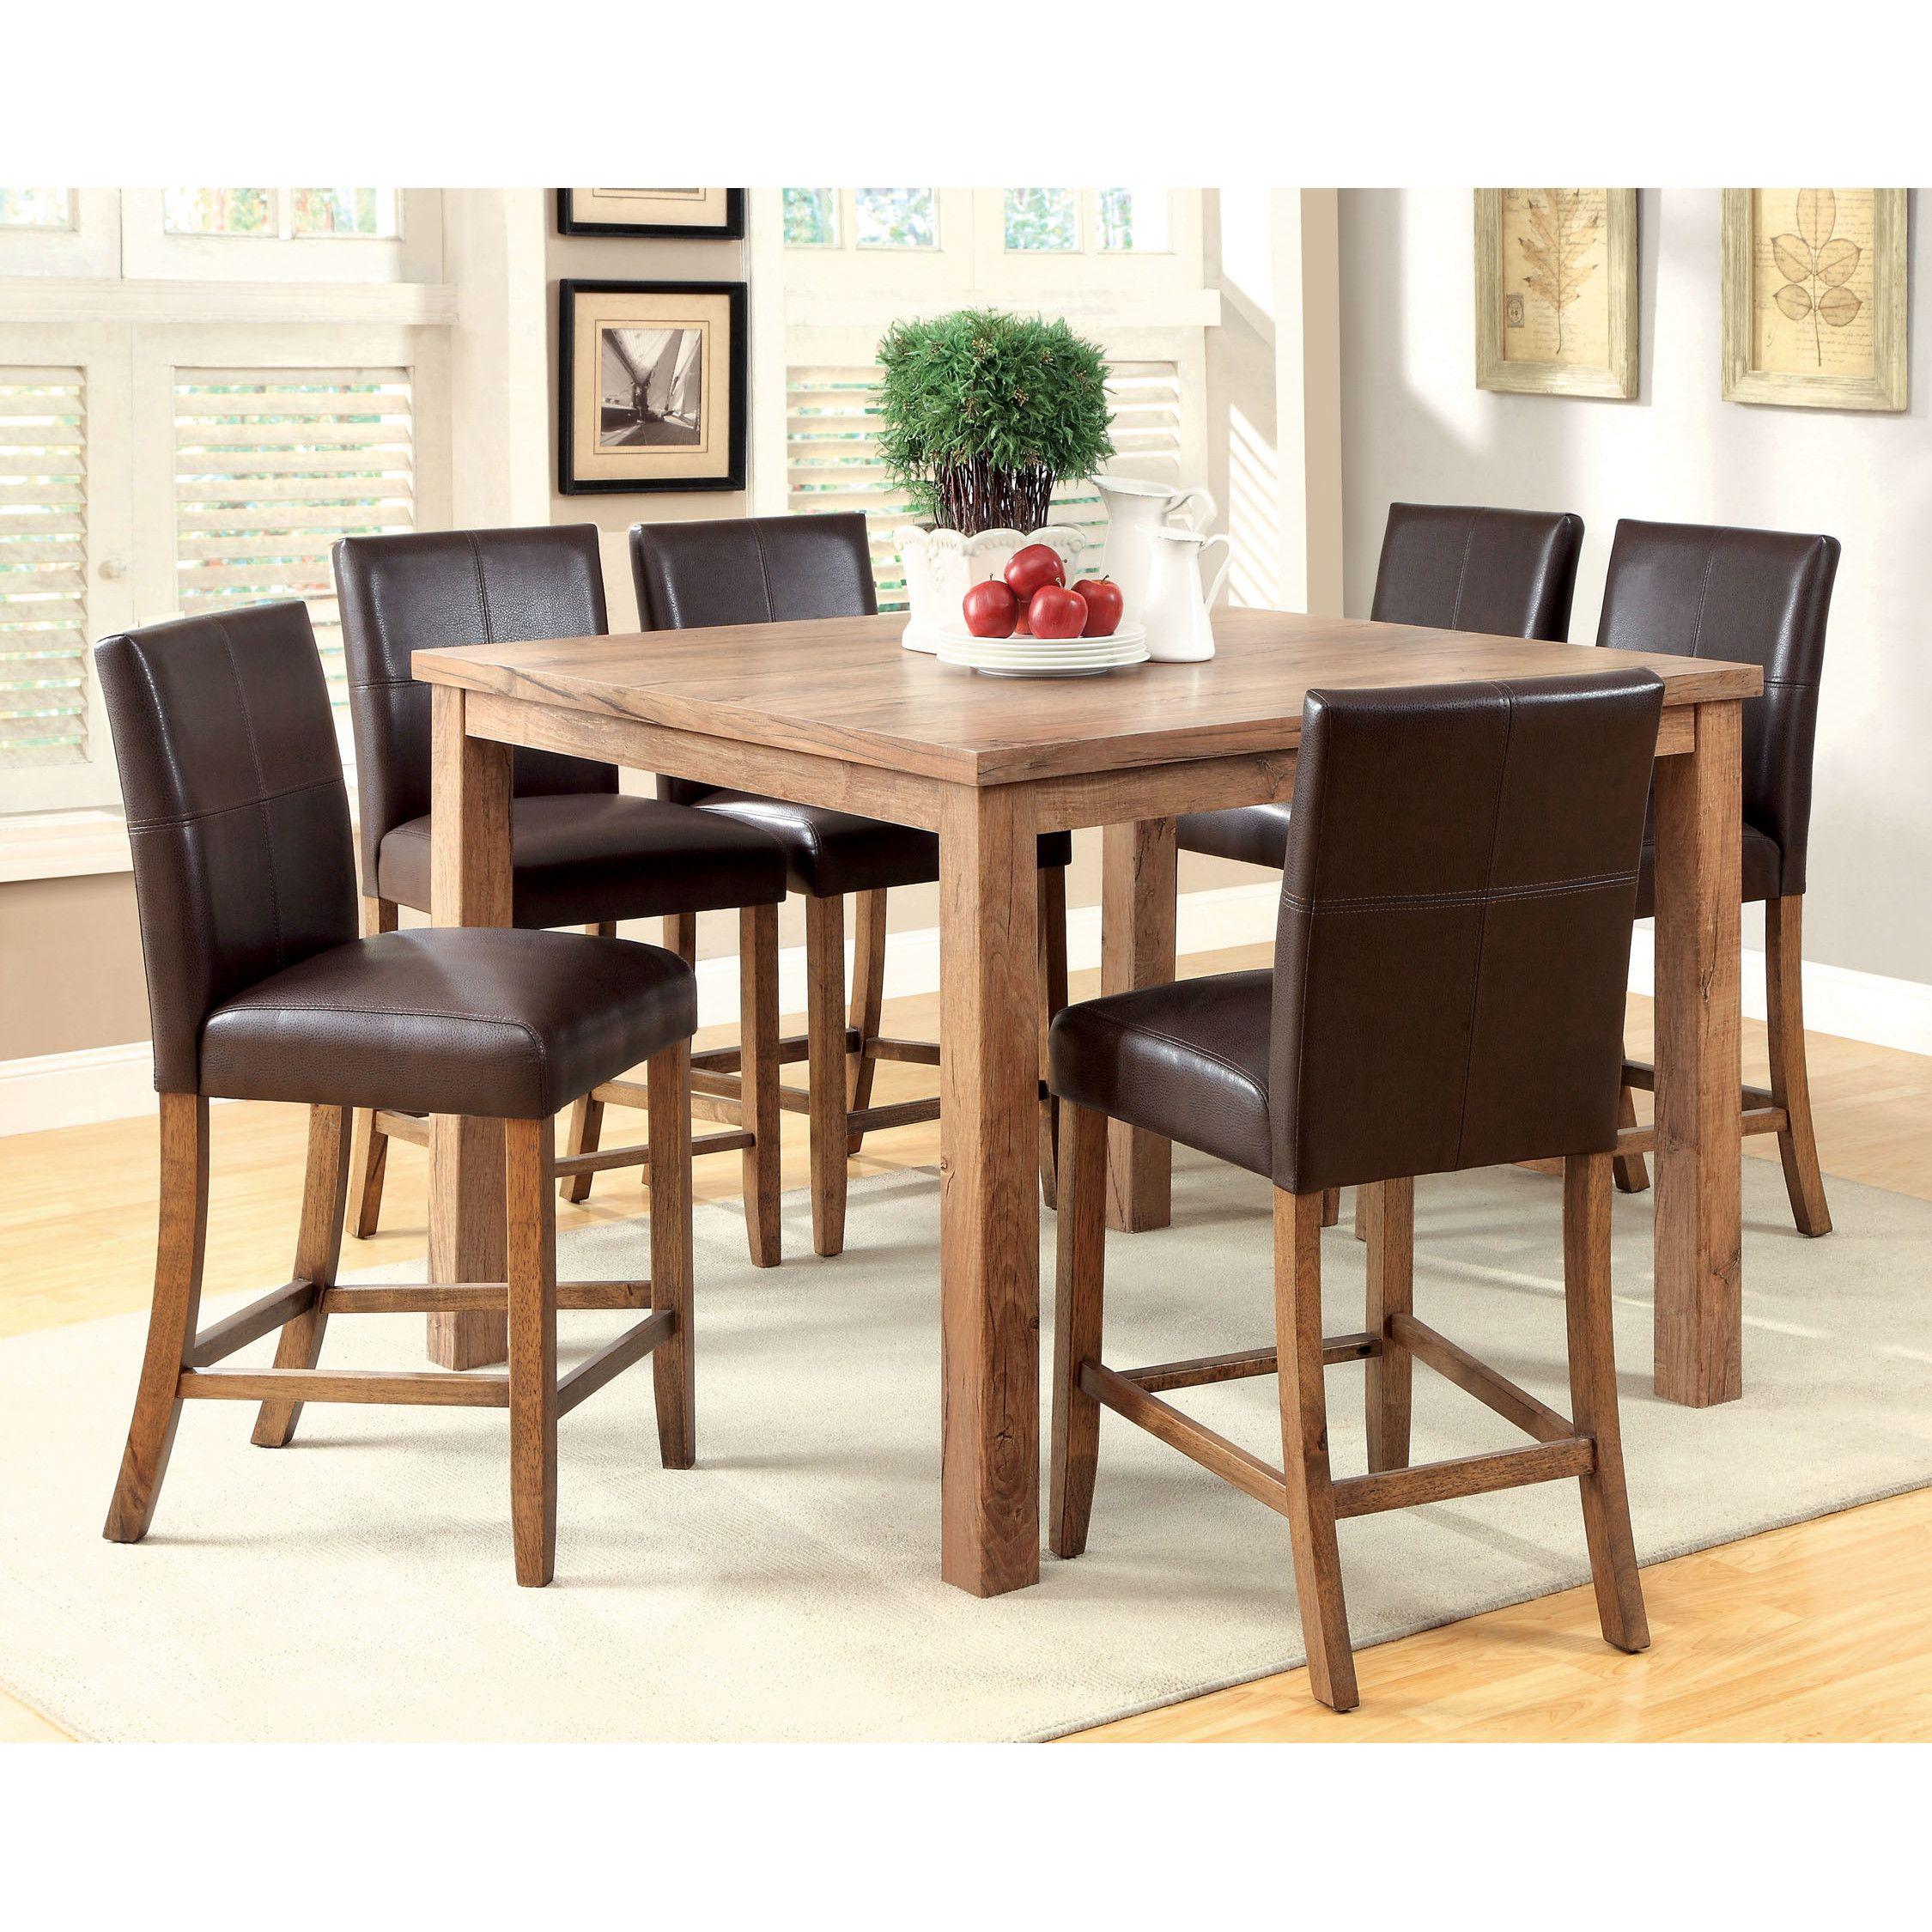 Hokku Designs Corzovan Counter Height Dining Table